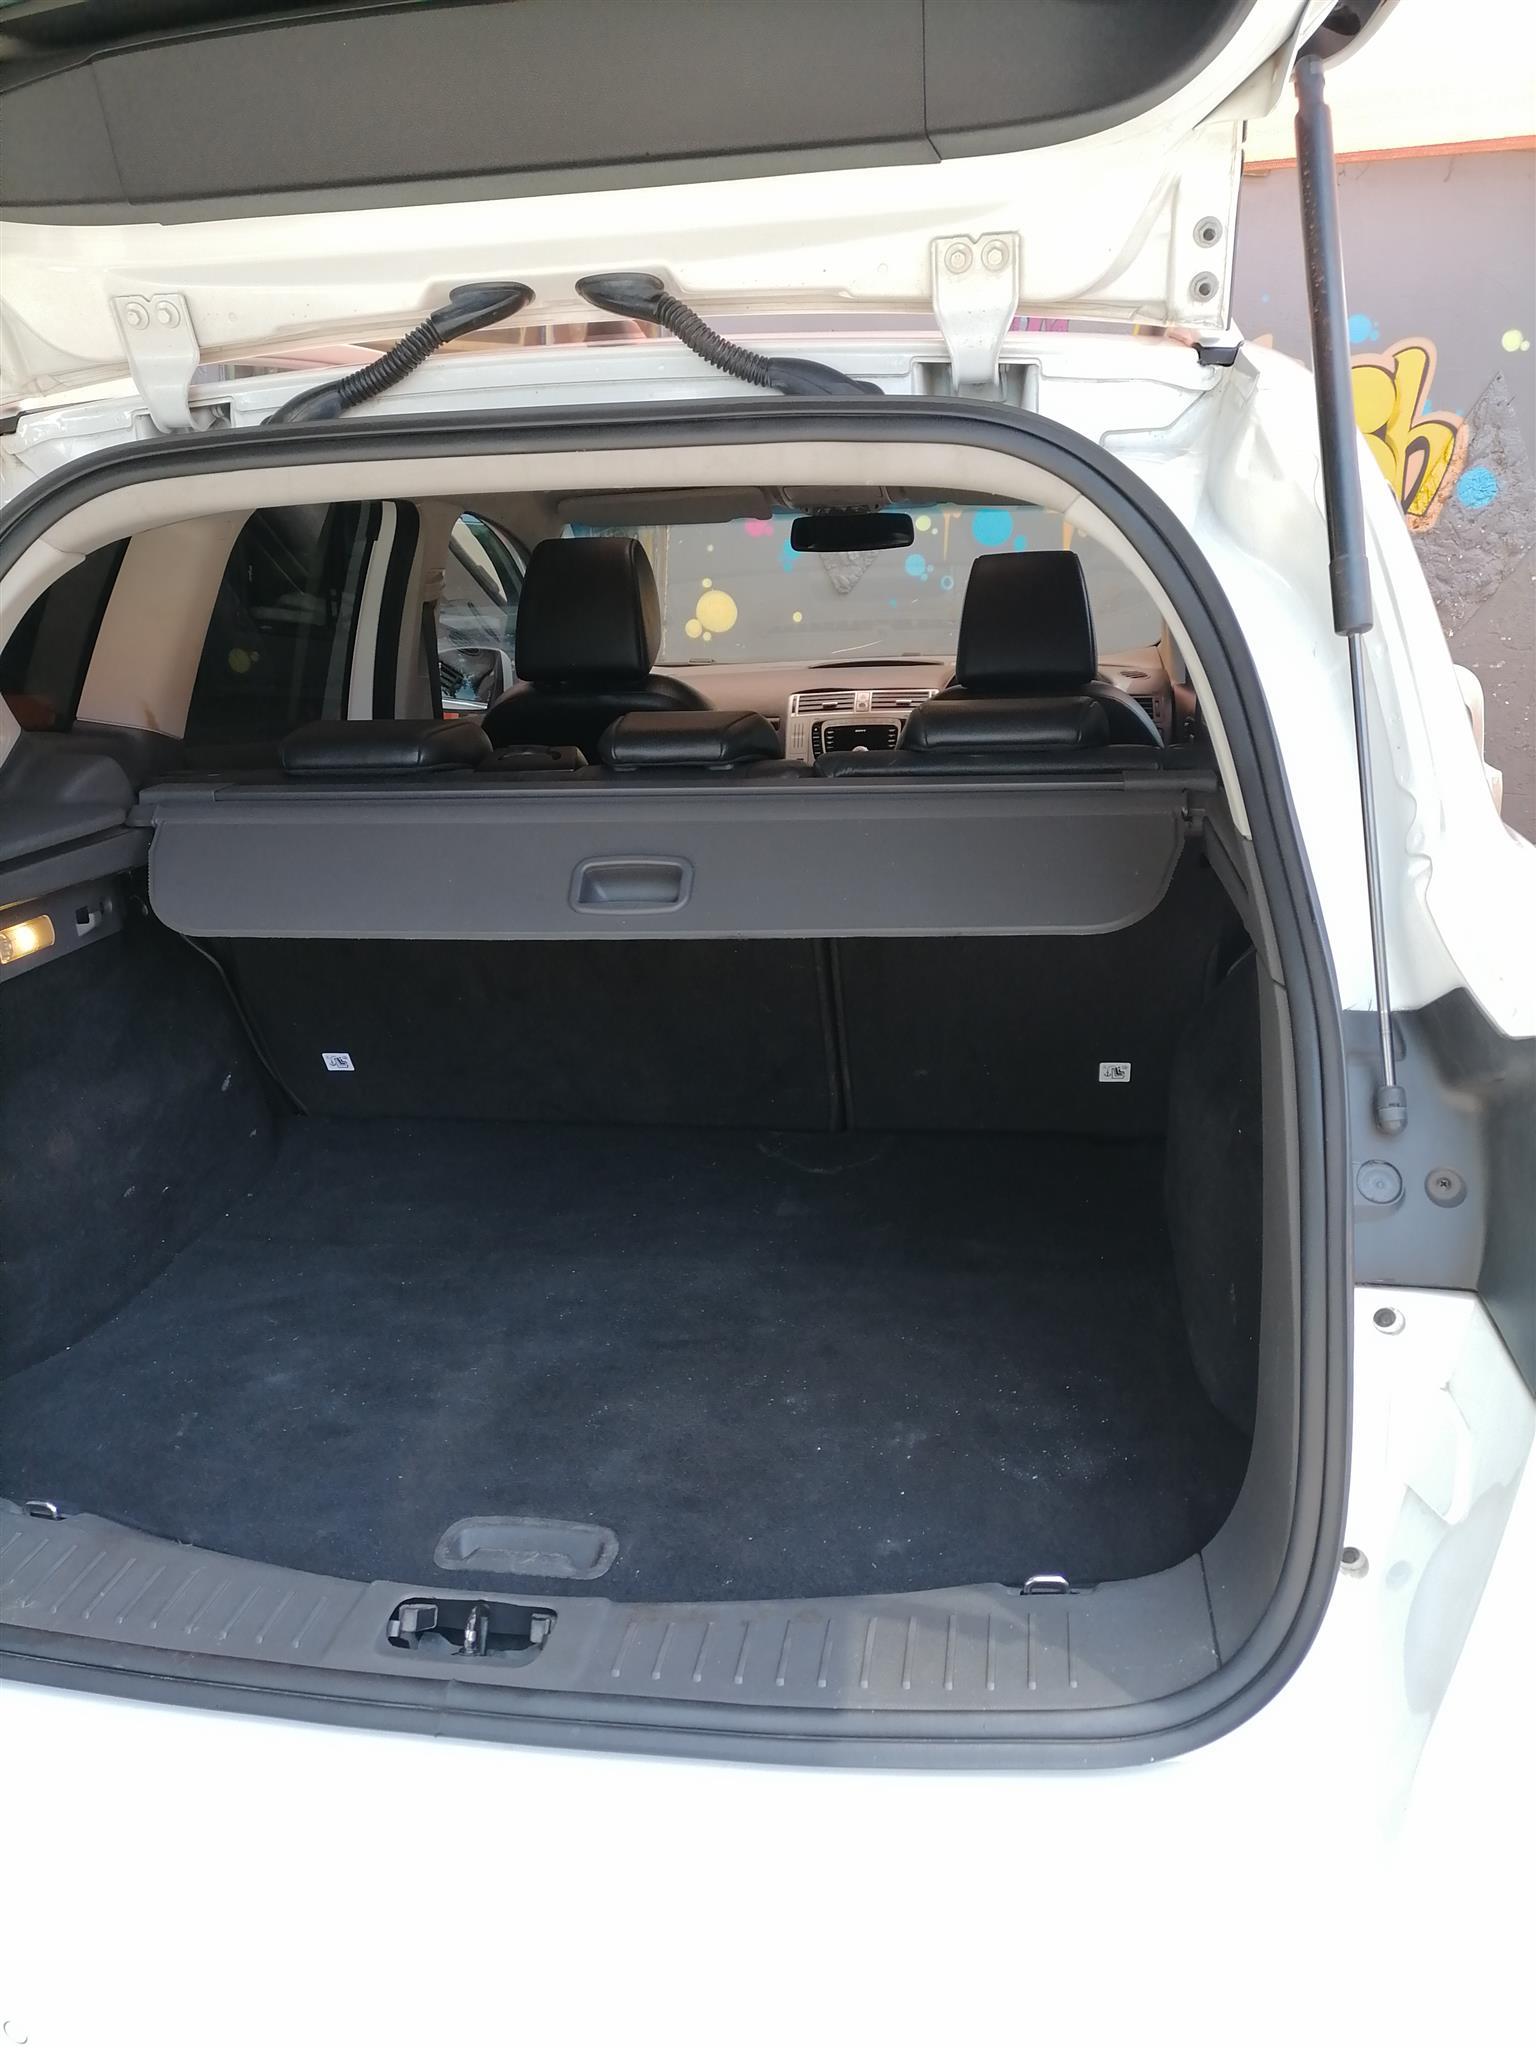 2013 Ford Kuga 2.5T AWD Titanium